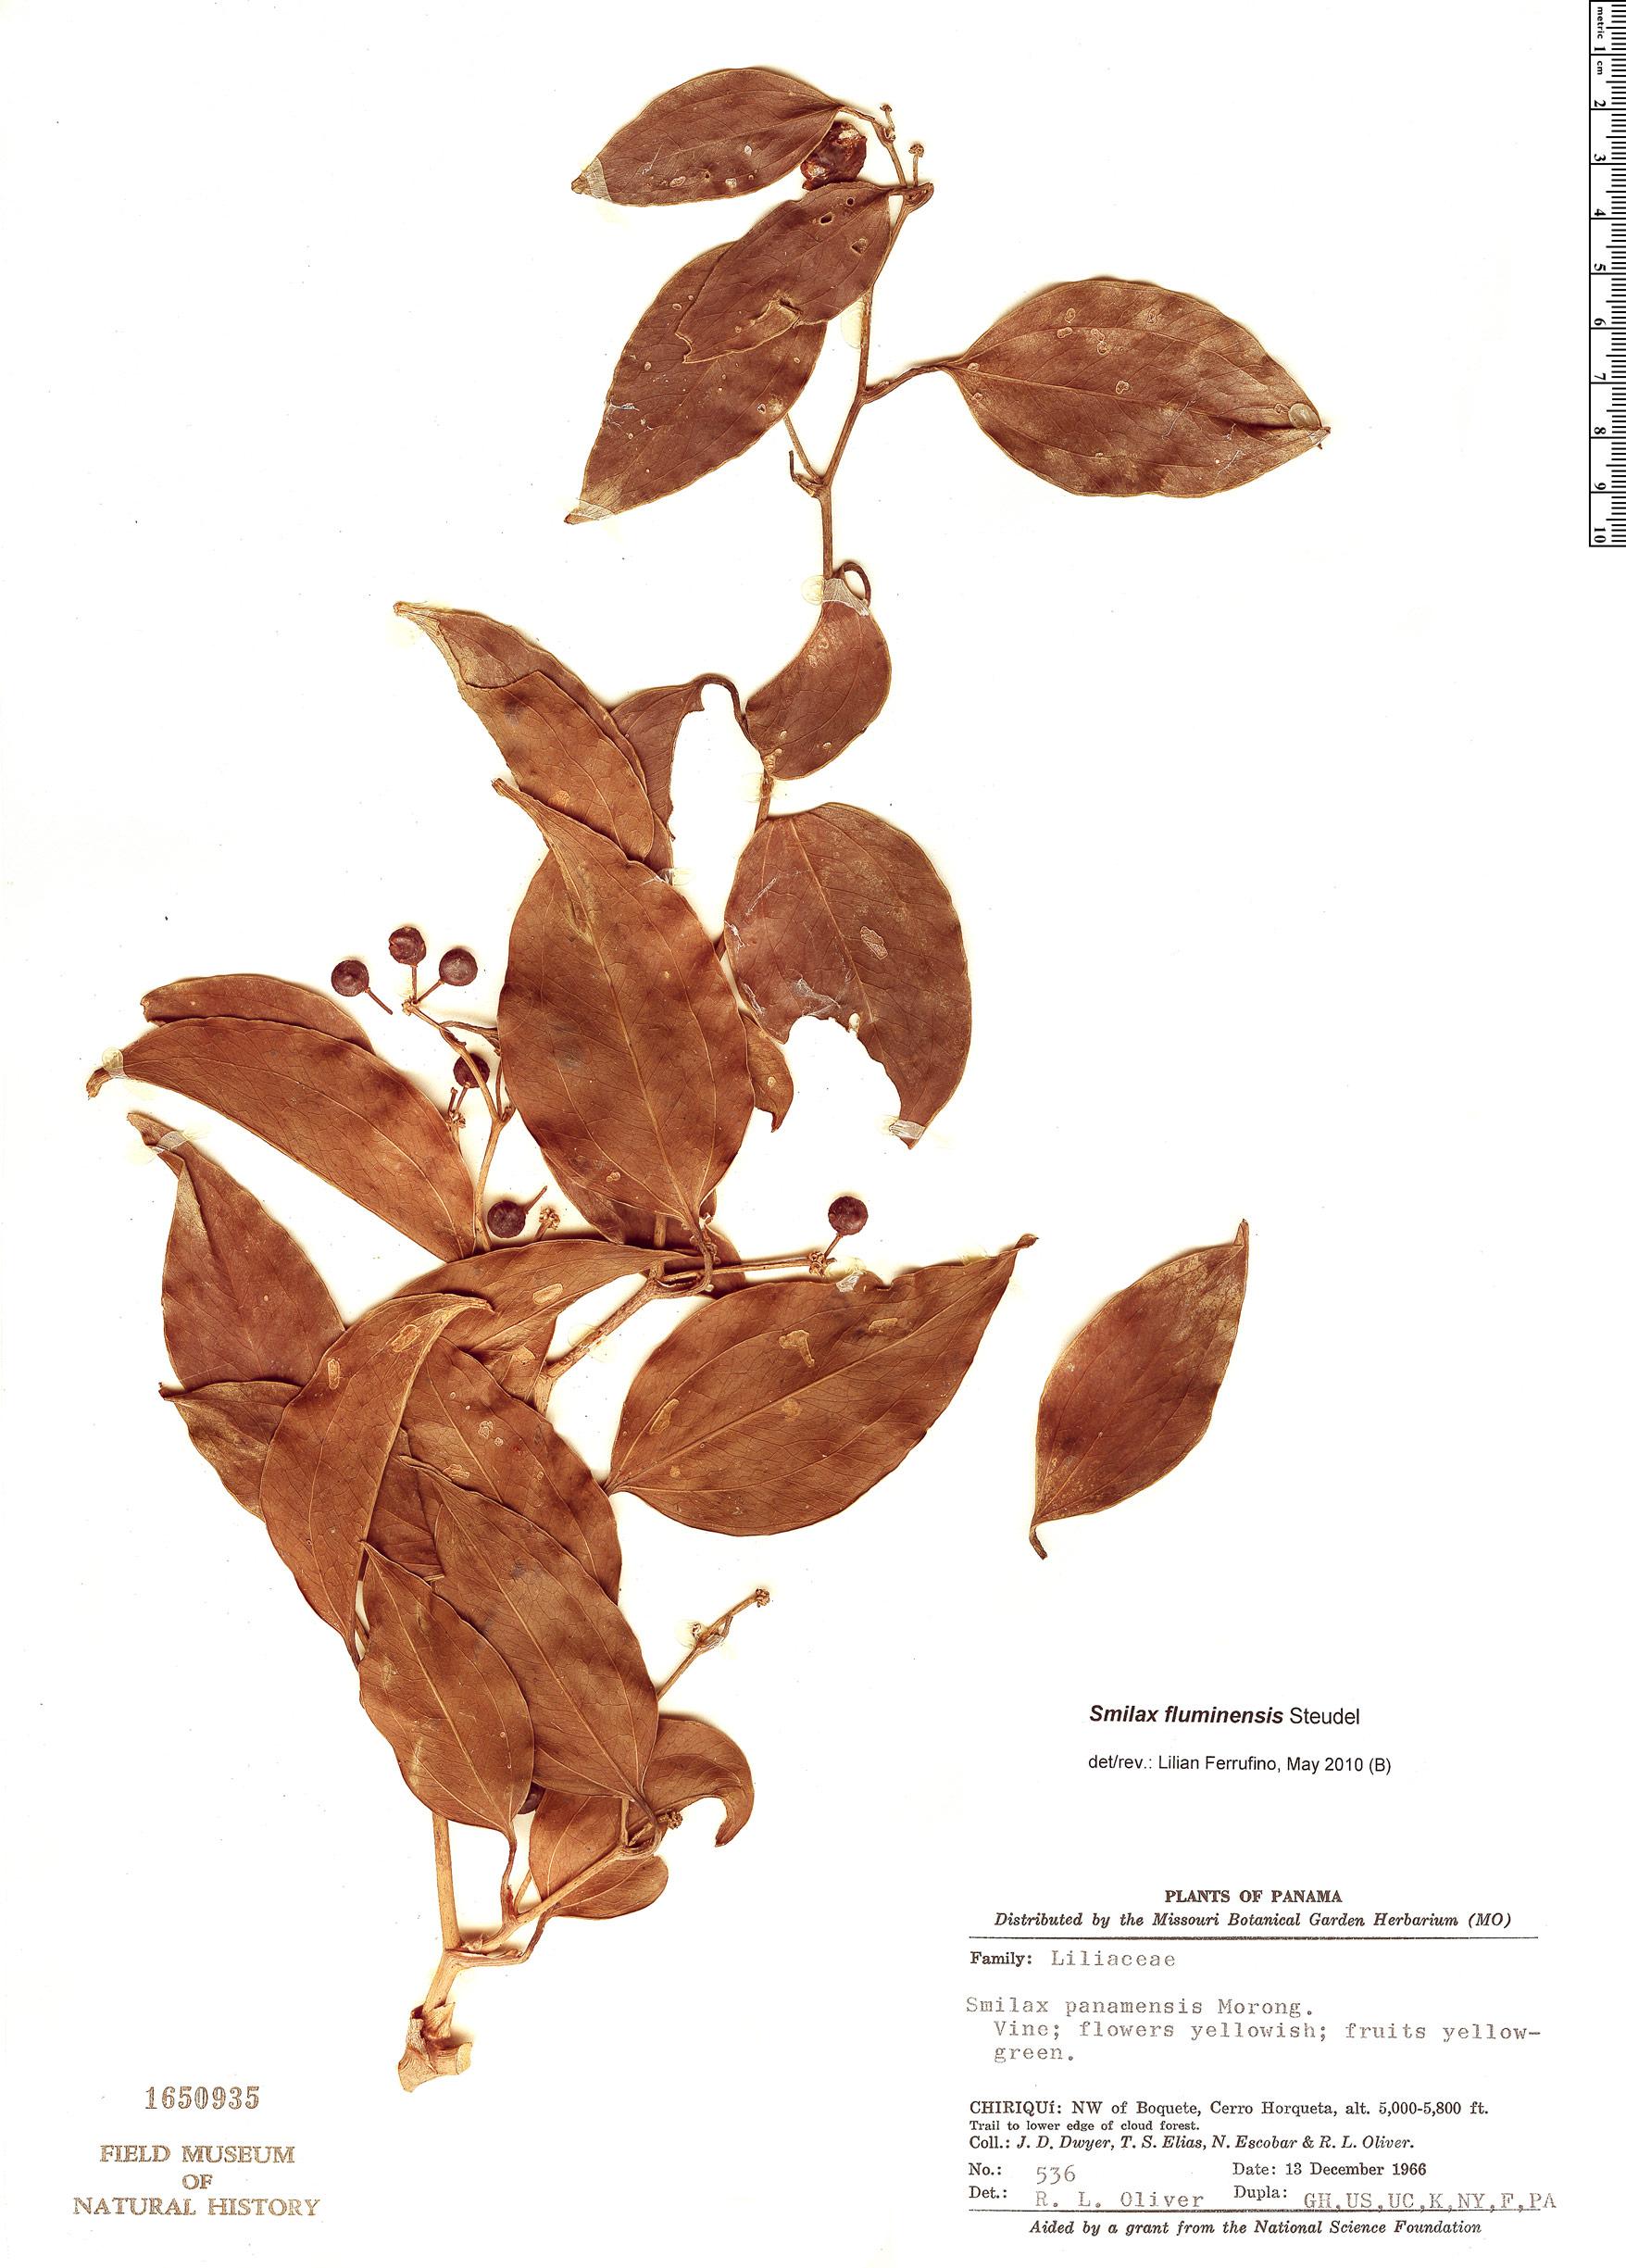 Specimen: Smilax fluminensis